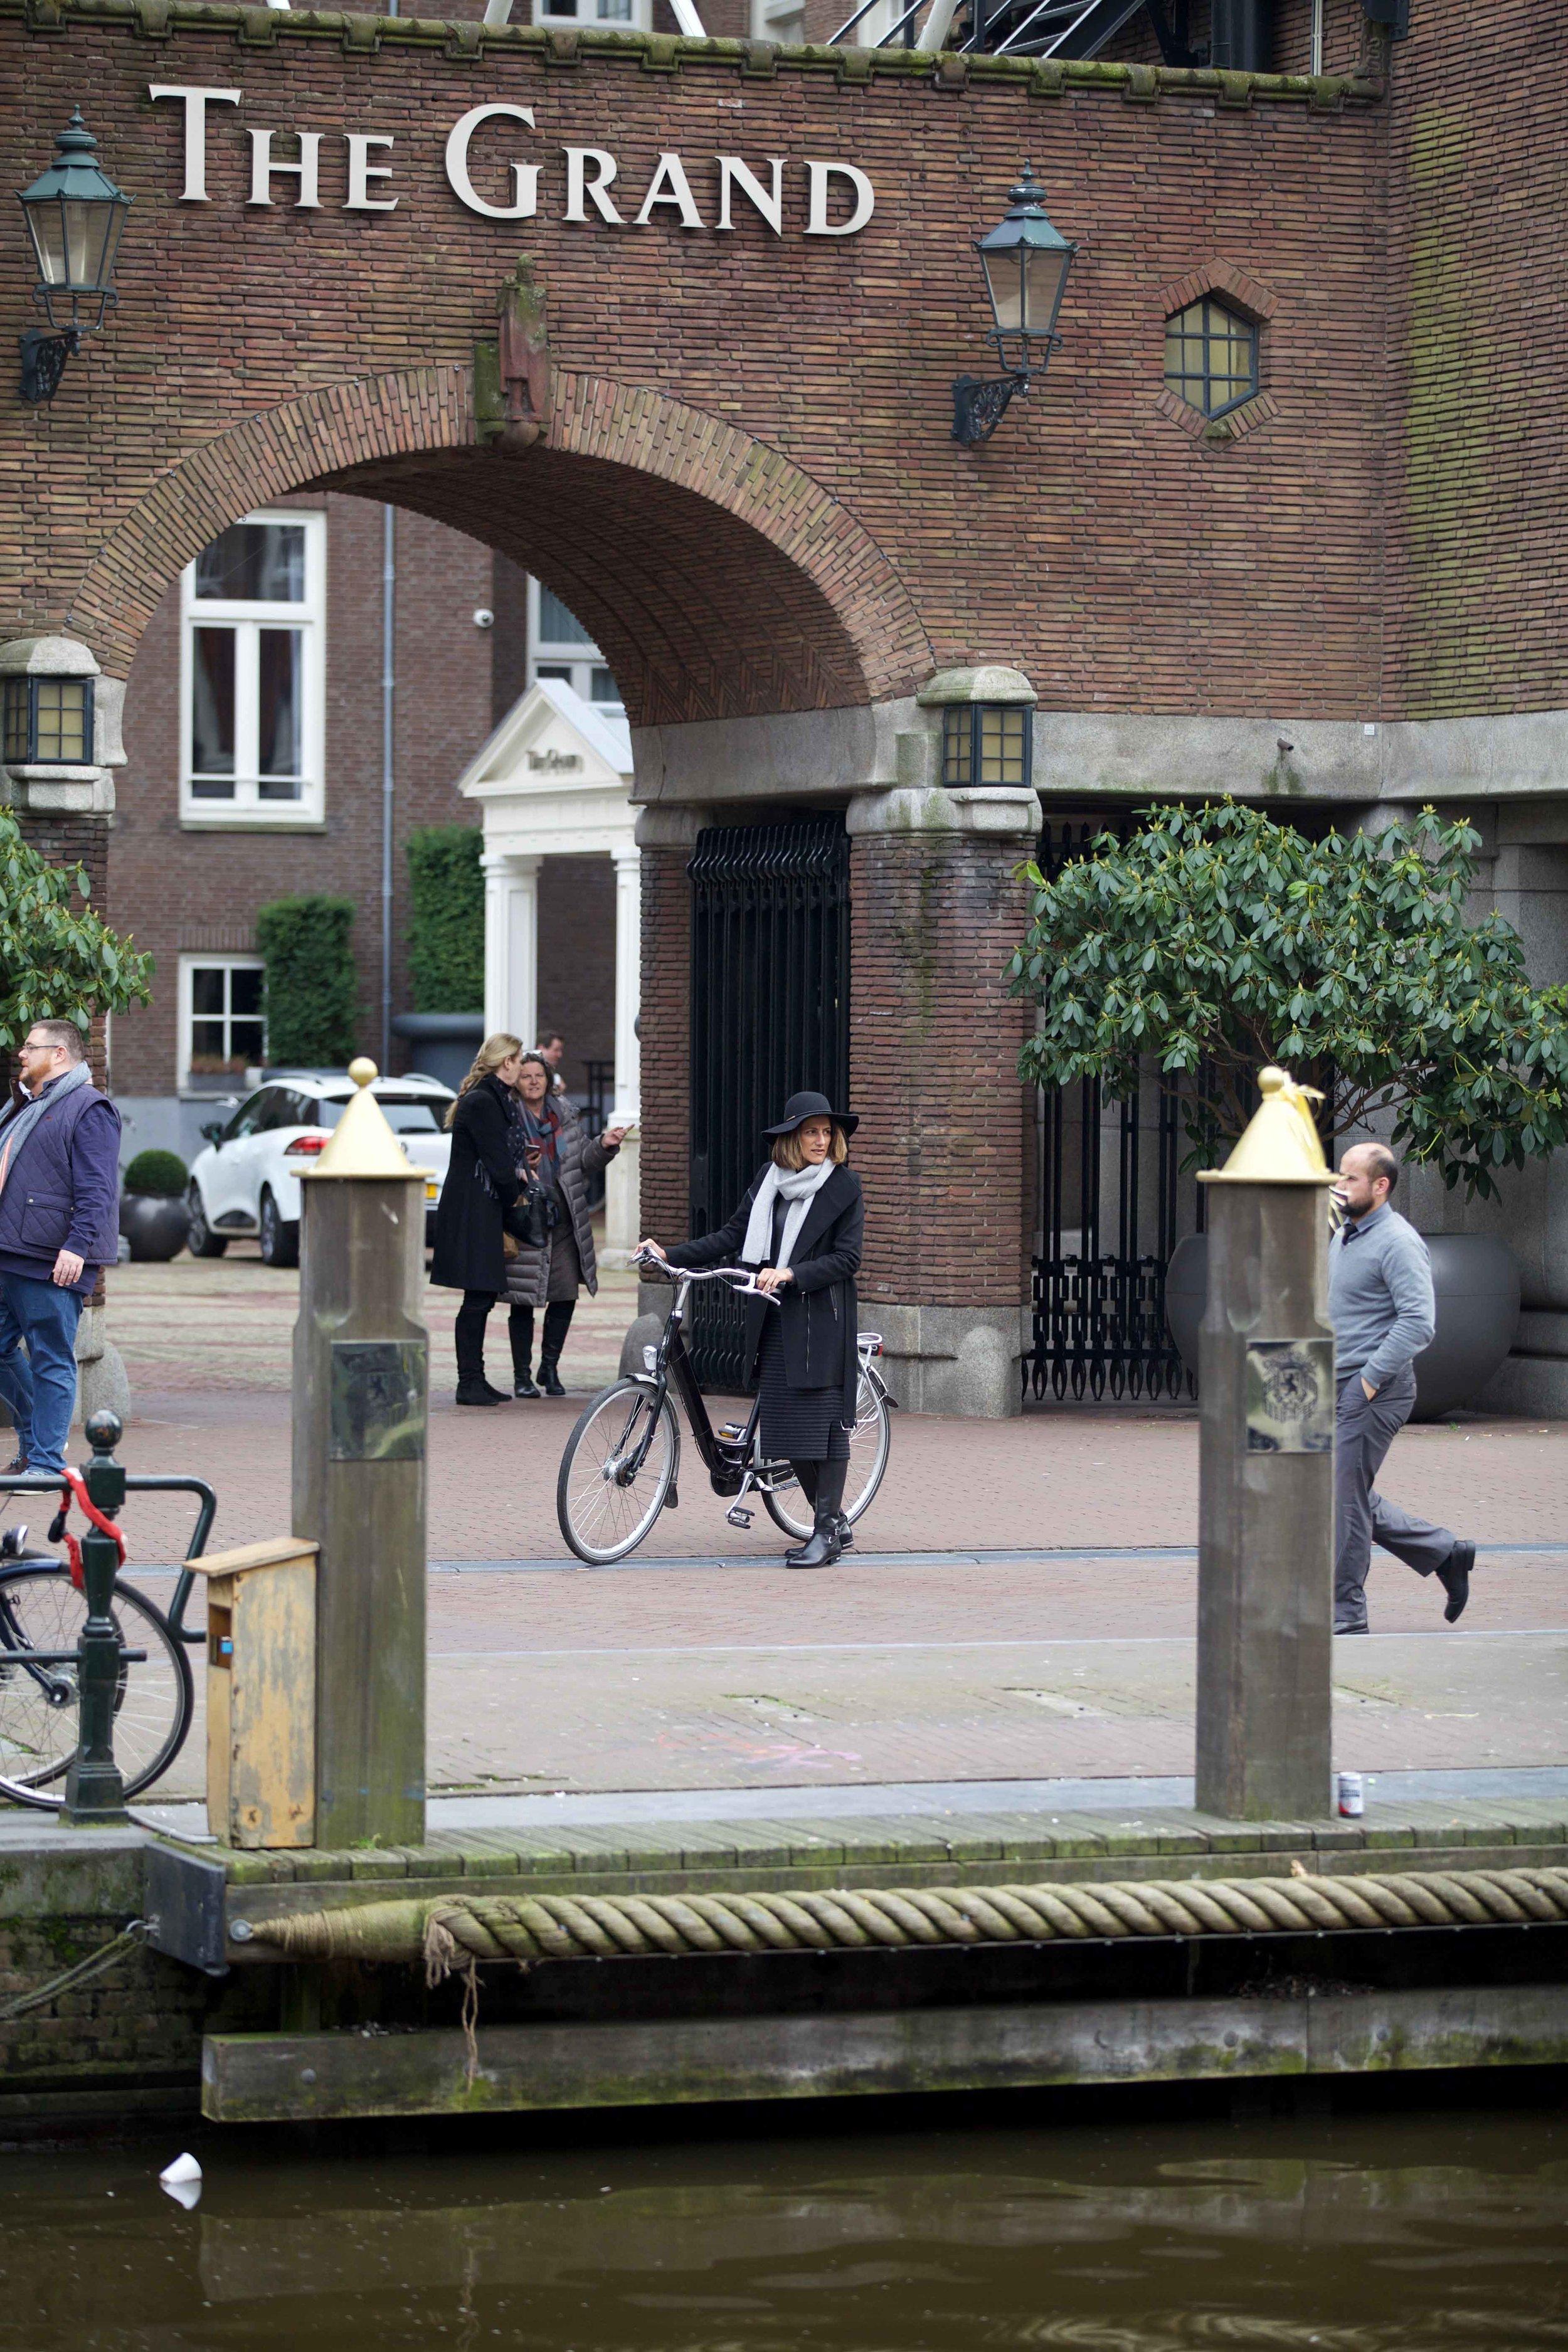 Grand bike tour,Sofitel Legend Amsterdam The Grand. Photo: Fabio Ricci. Image©thingstodot.com